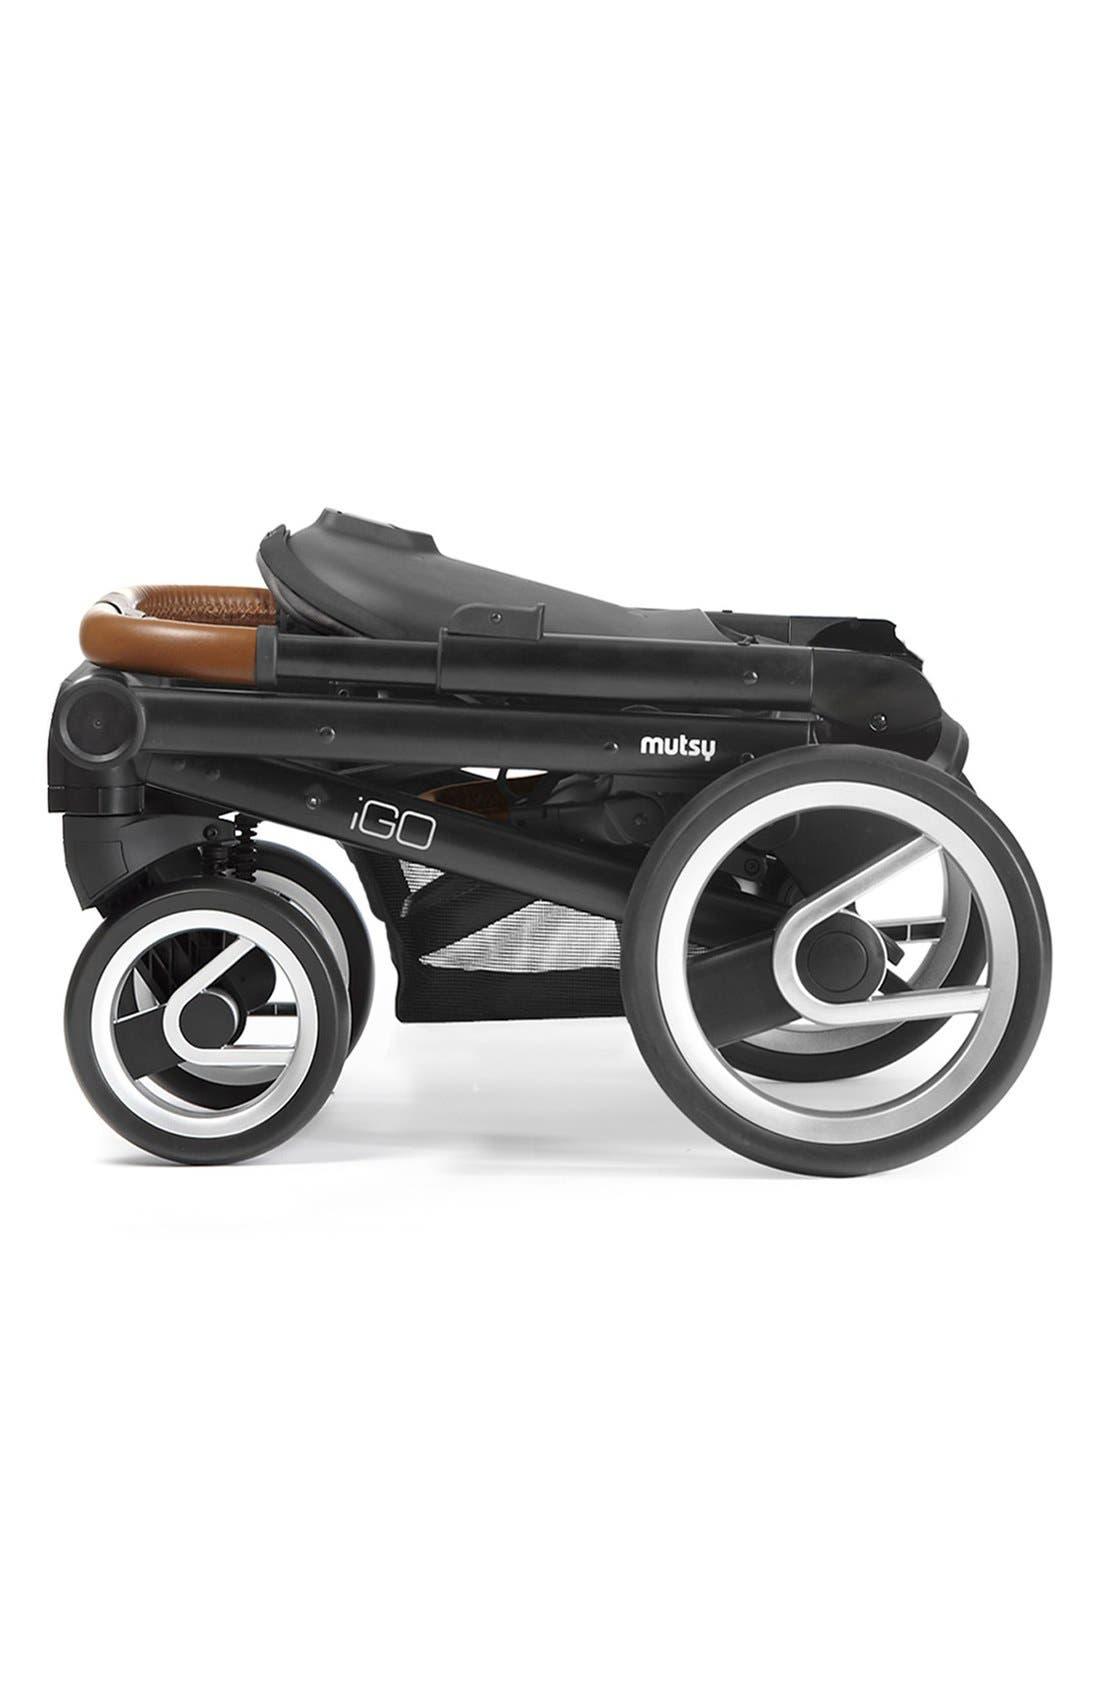 Igo - Urban Nomad Stroller,                             Alternate thumbnail 6, color,                             Black/ White/ Blue